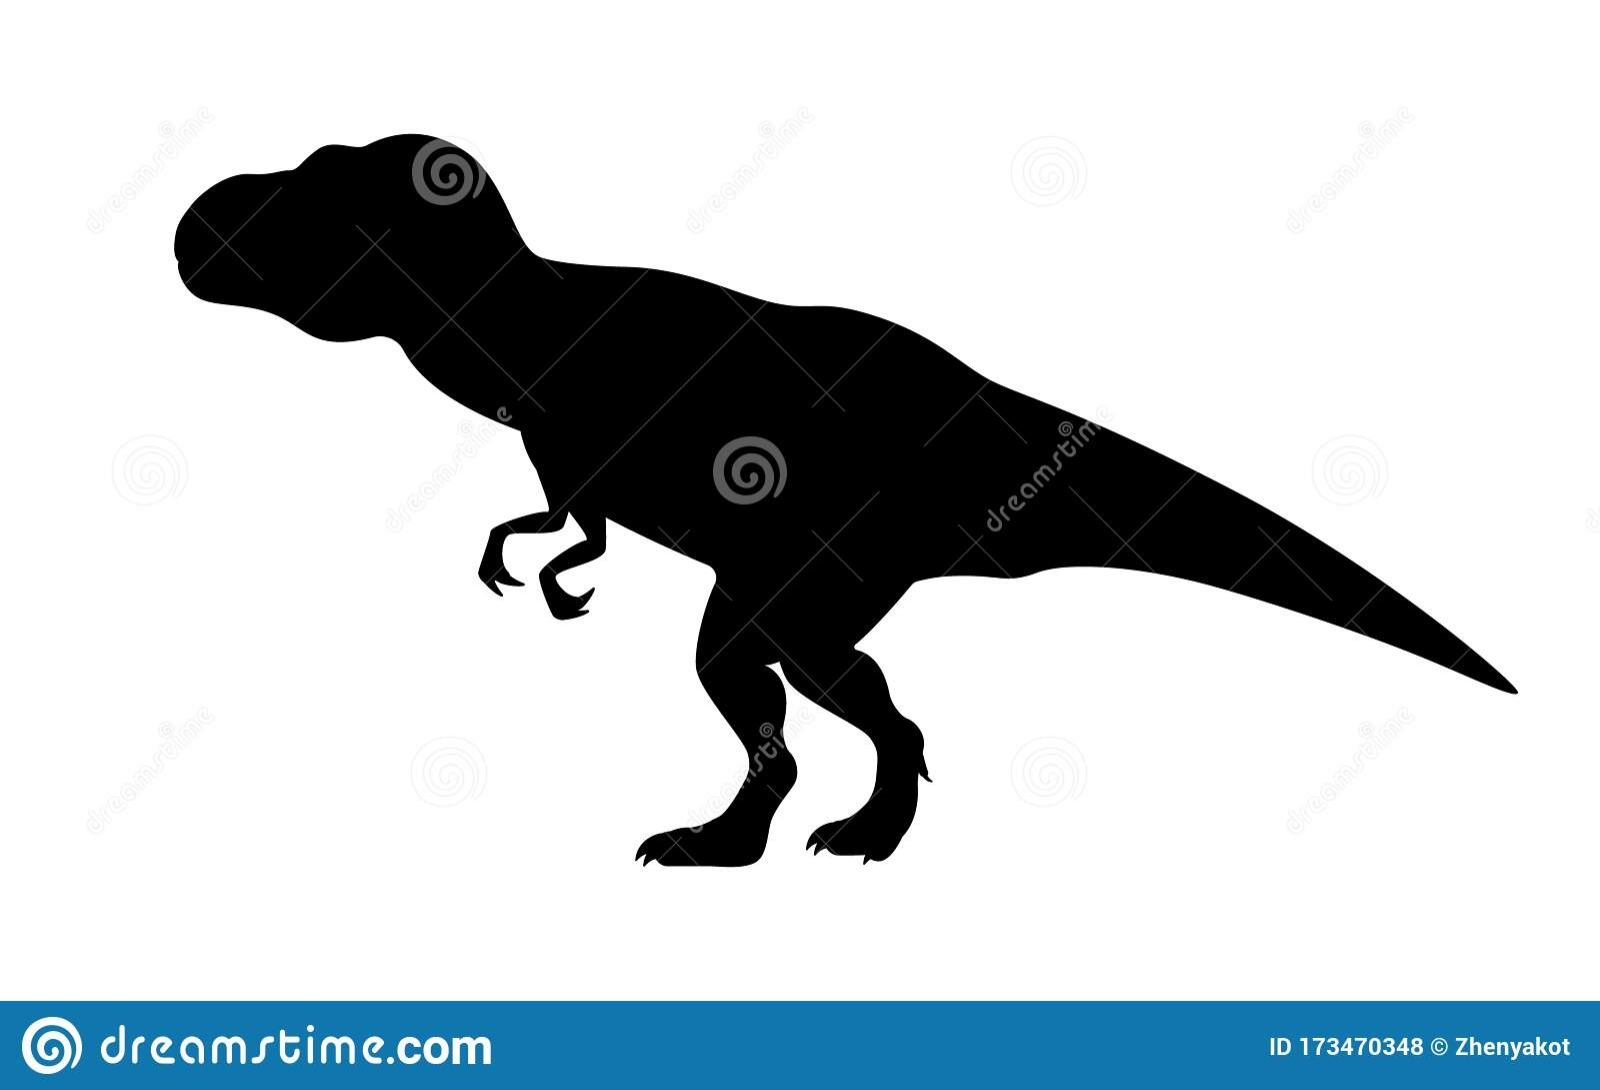 24+ Jurassic World T Rex Side View JPG